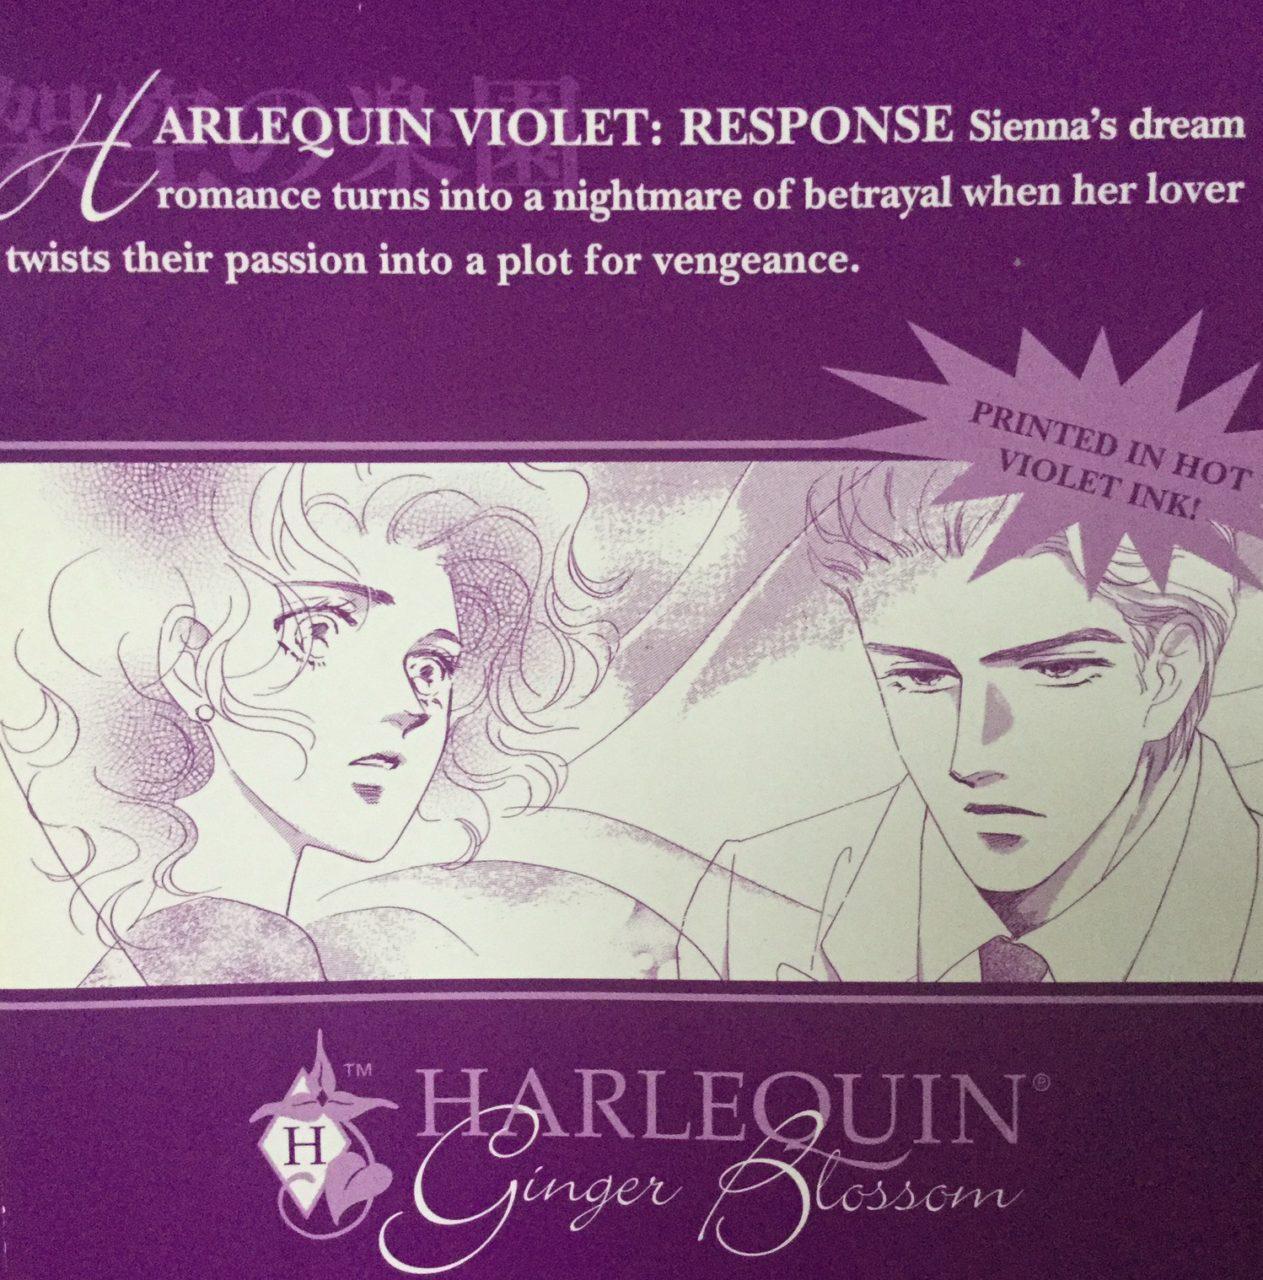 Harlequin Violet & Harlequin Pink: Manga Romance Fusion!